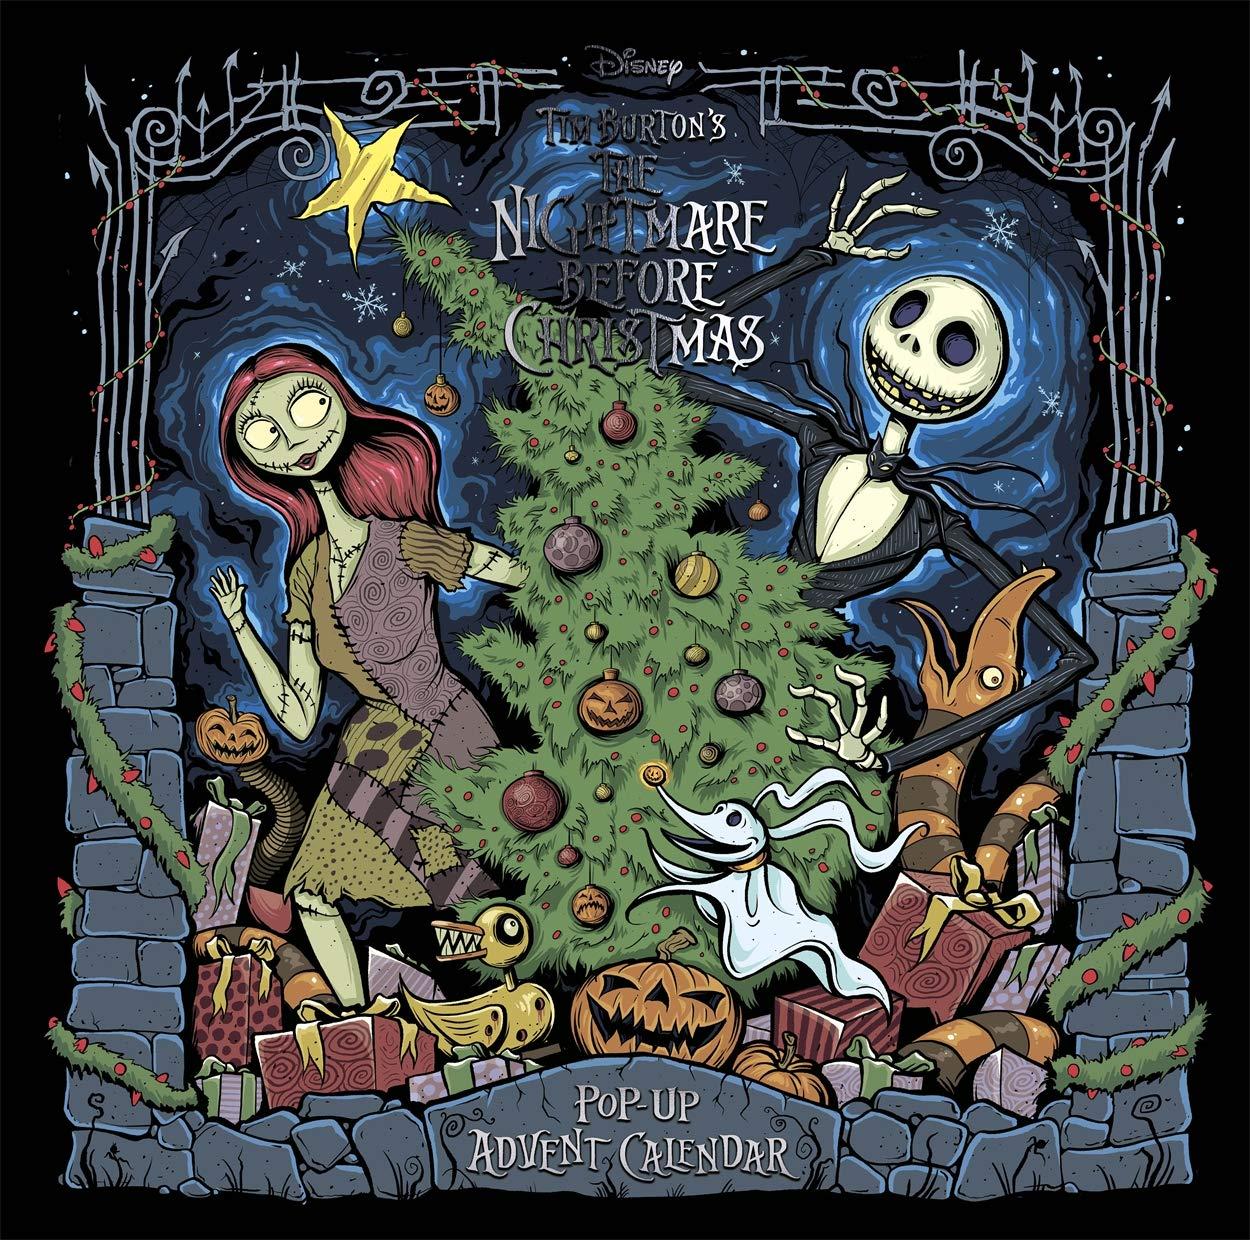 The Nightmare Before Christmas Pop-Up Advent Calendar